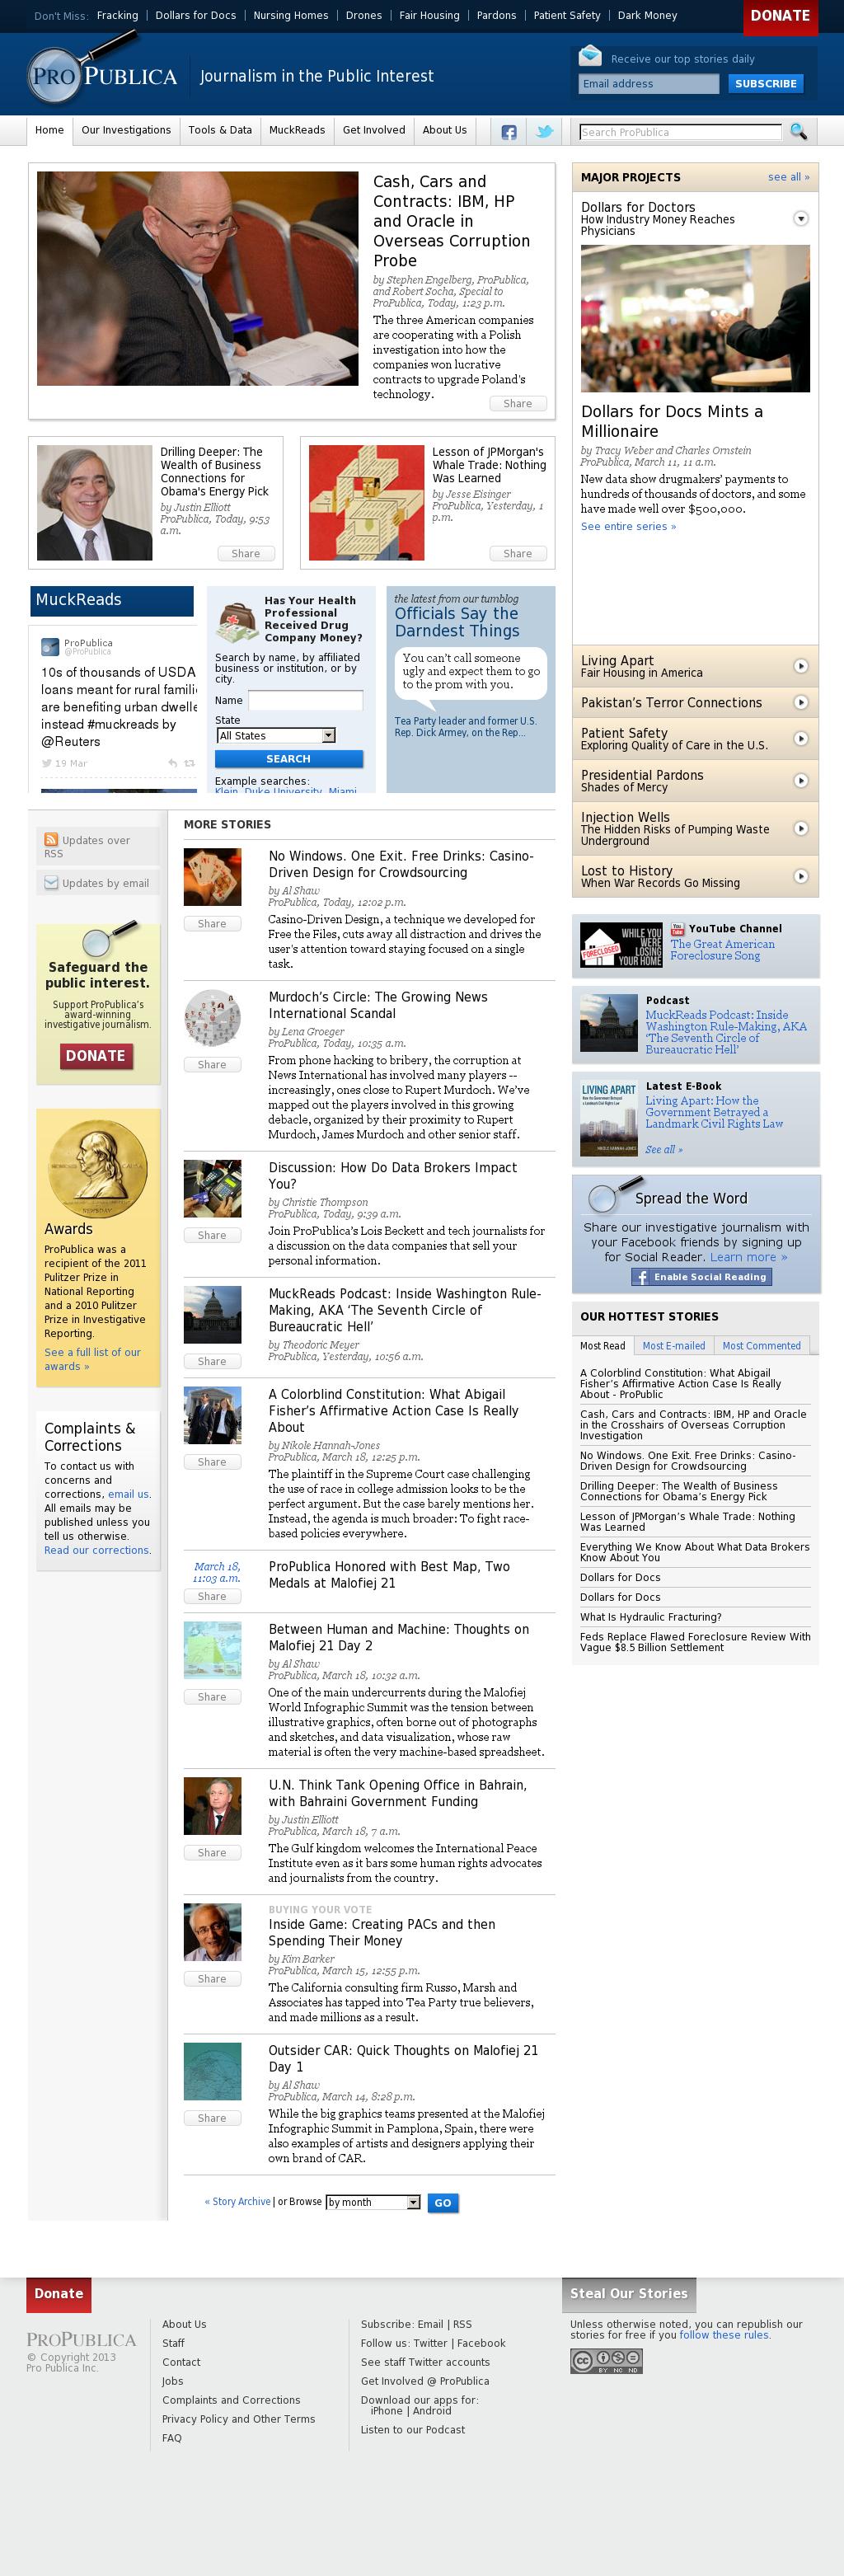 ProPublica at Wednesday March 20, 2013, 10:20 p.m. UTC